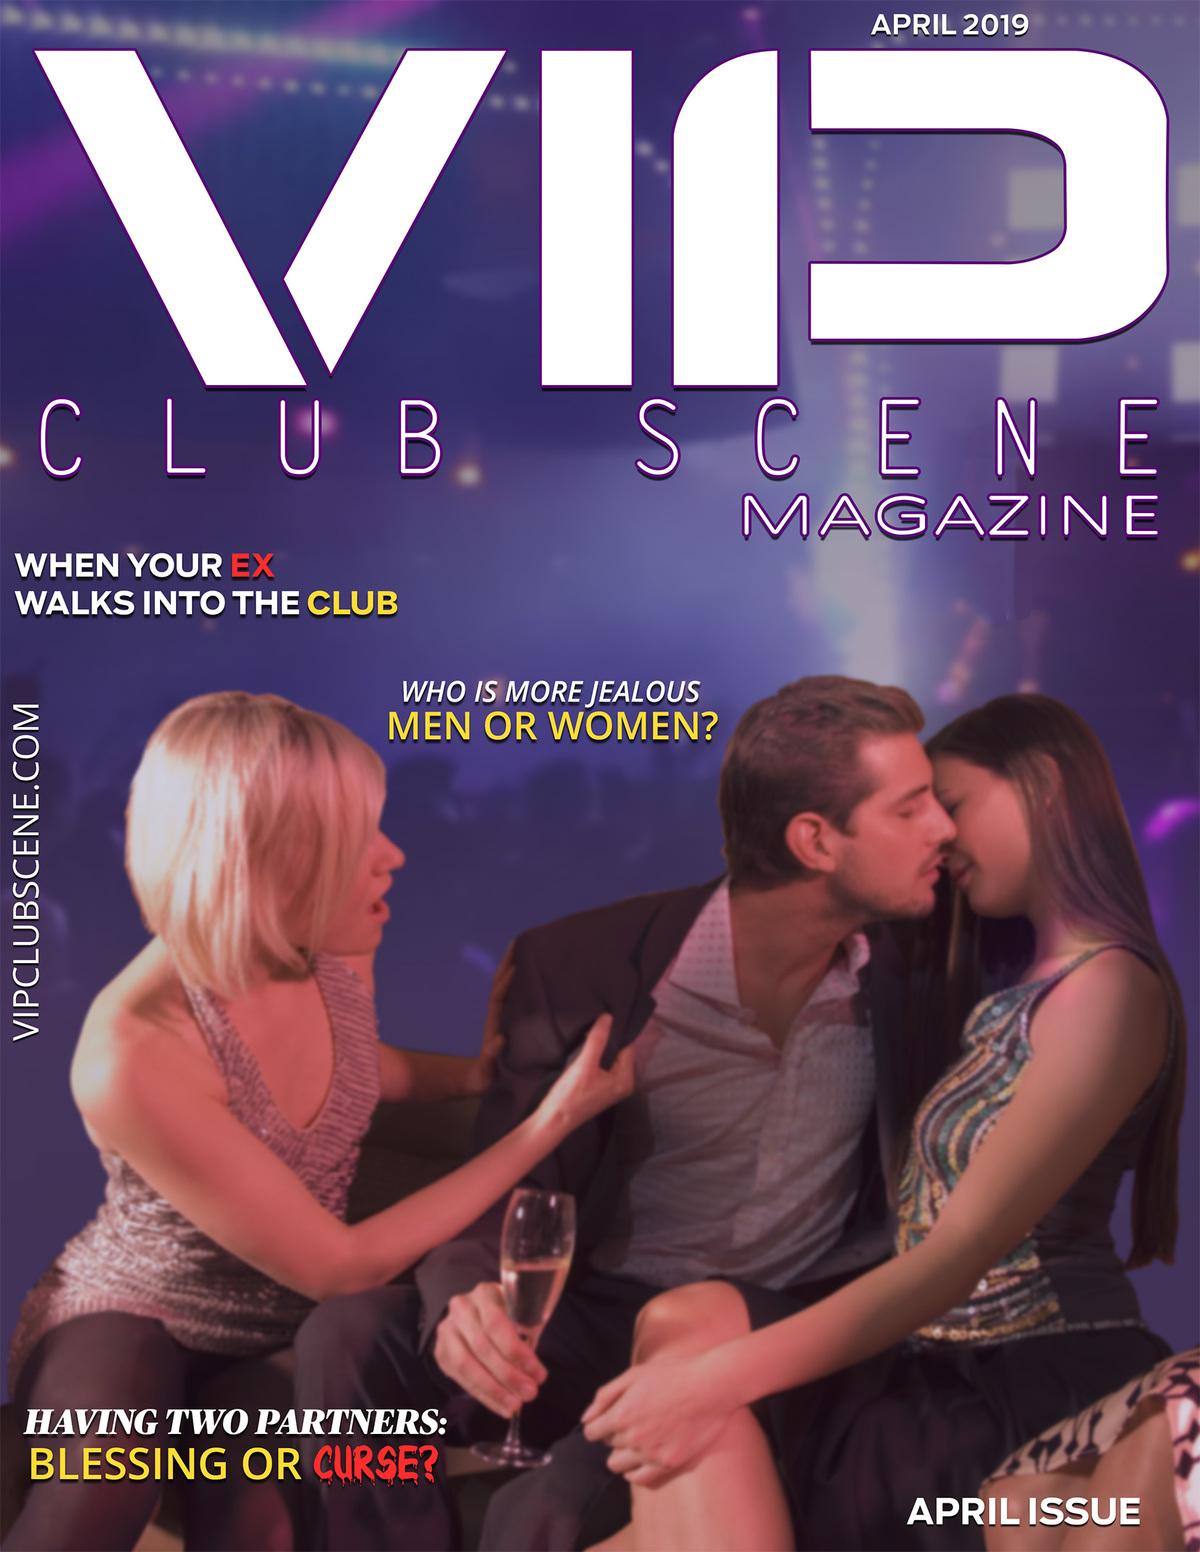 VIP CLUB SCENE MAGAZINE - WHEN YOUR EX WALKS INTO THE CLUB - APRIL ISSUE